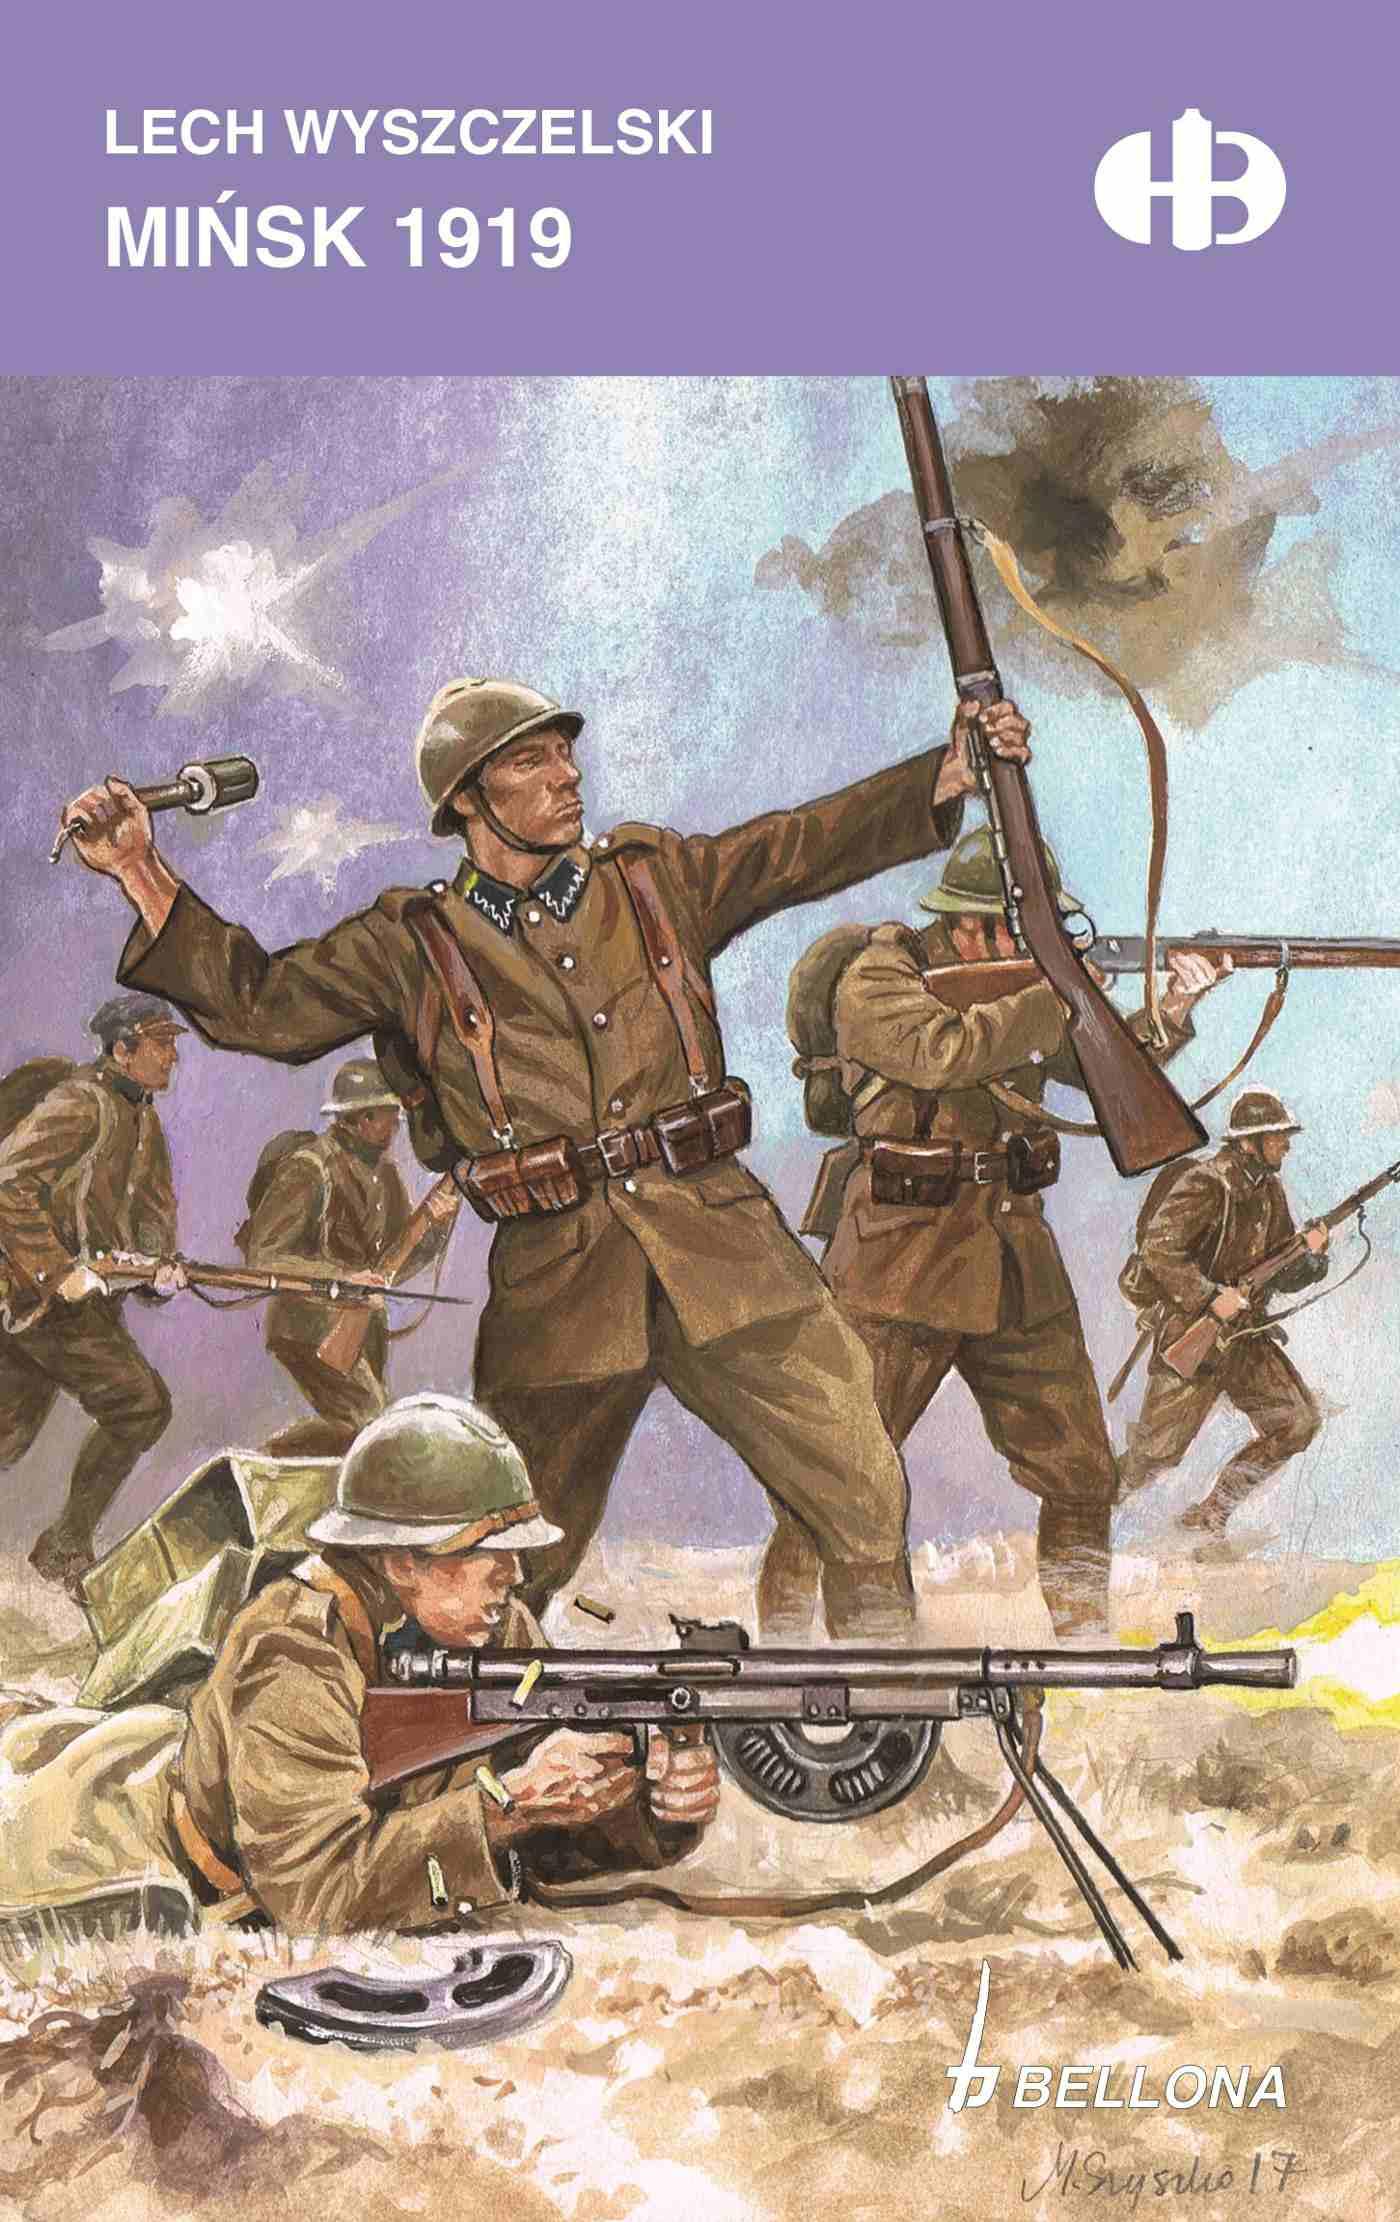 Mińsk 1919 - Ebook (Książka EPUB) do pobrania w formacie EPUB